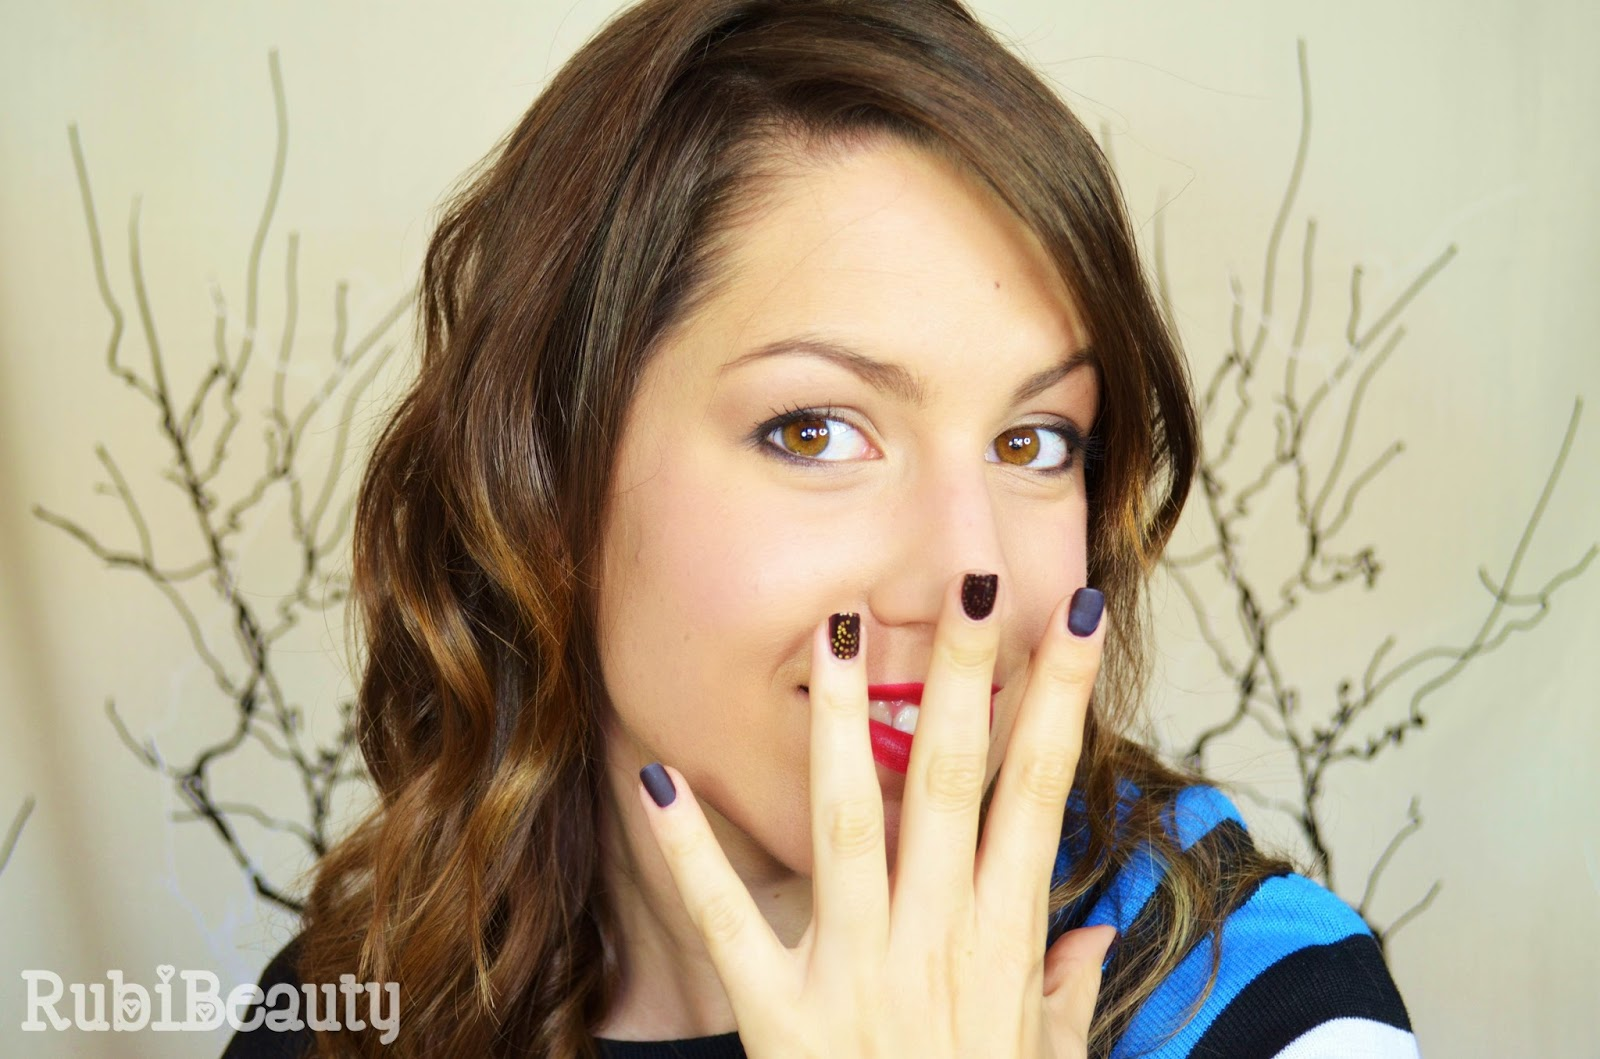 rubibeauty emma watson maquillaje sencillo manicura puntos tips